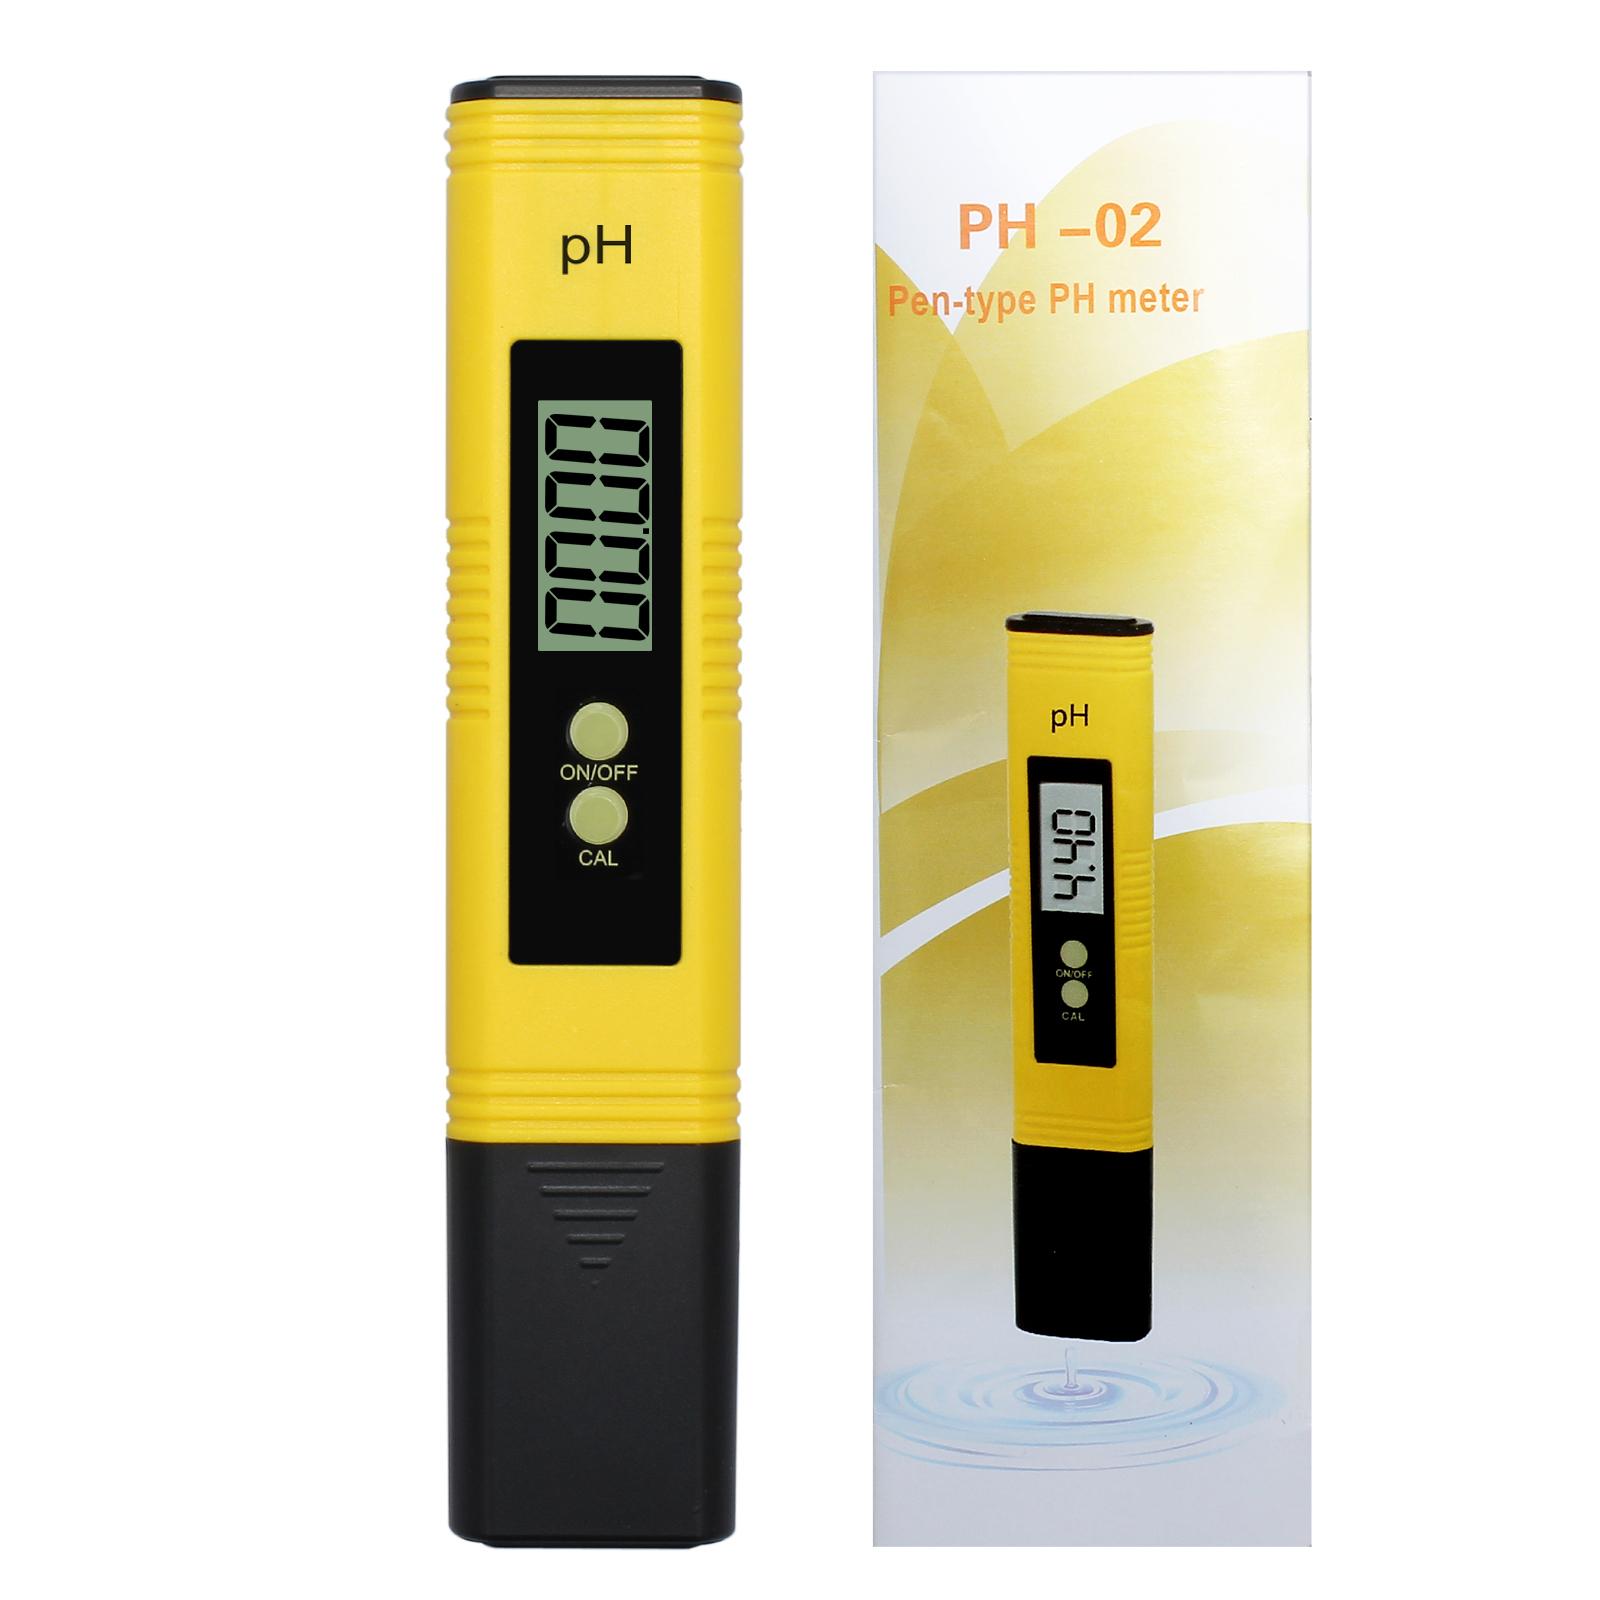 LCD Digital PH Meter Tester Pocket Portable Pool Water Aquarium Hydroponic Wine